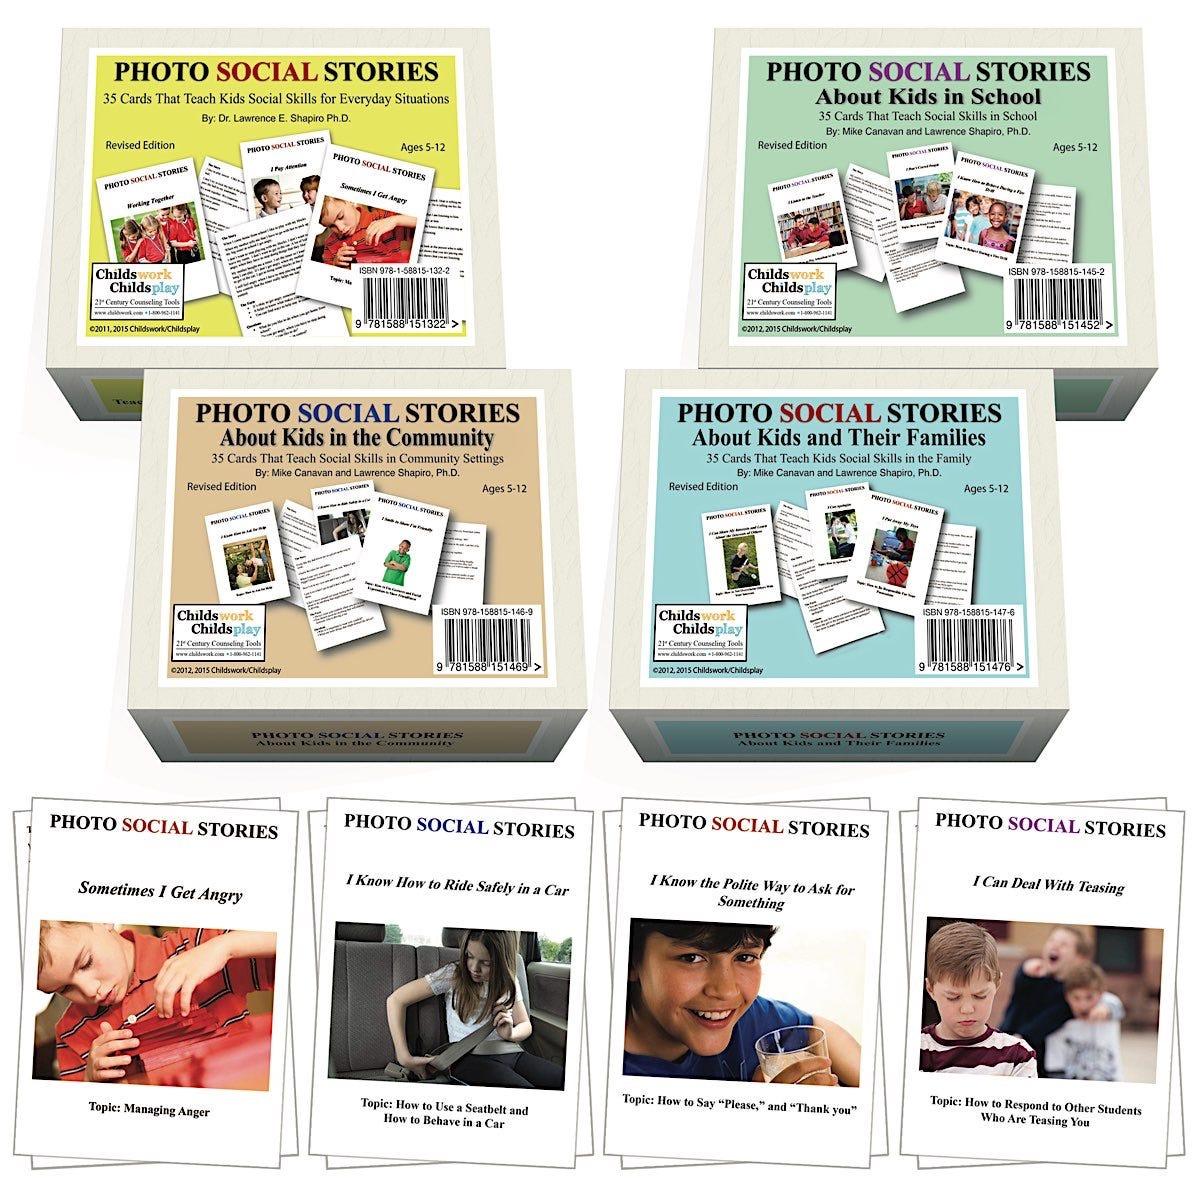 Photo Social Stories Card Games